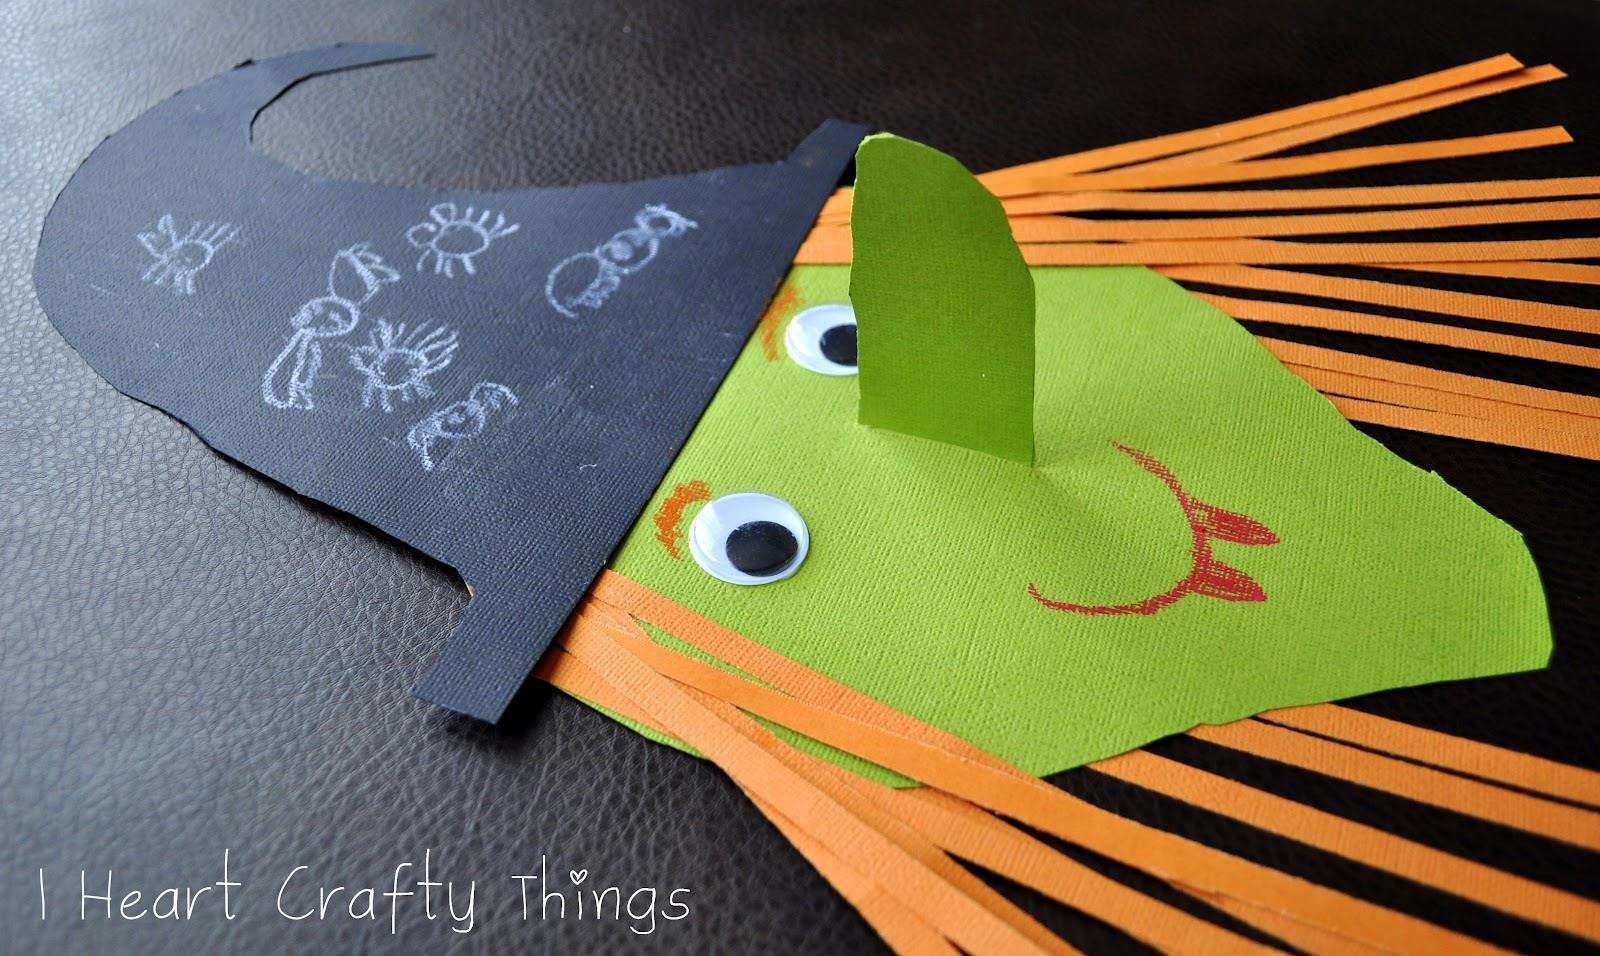 Manualidades Halloween Ninos.Halloween Manualidades Para Ninos 25 Imagenes Educativas